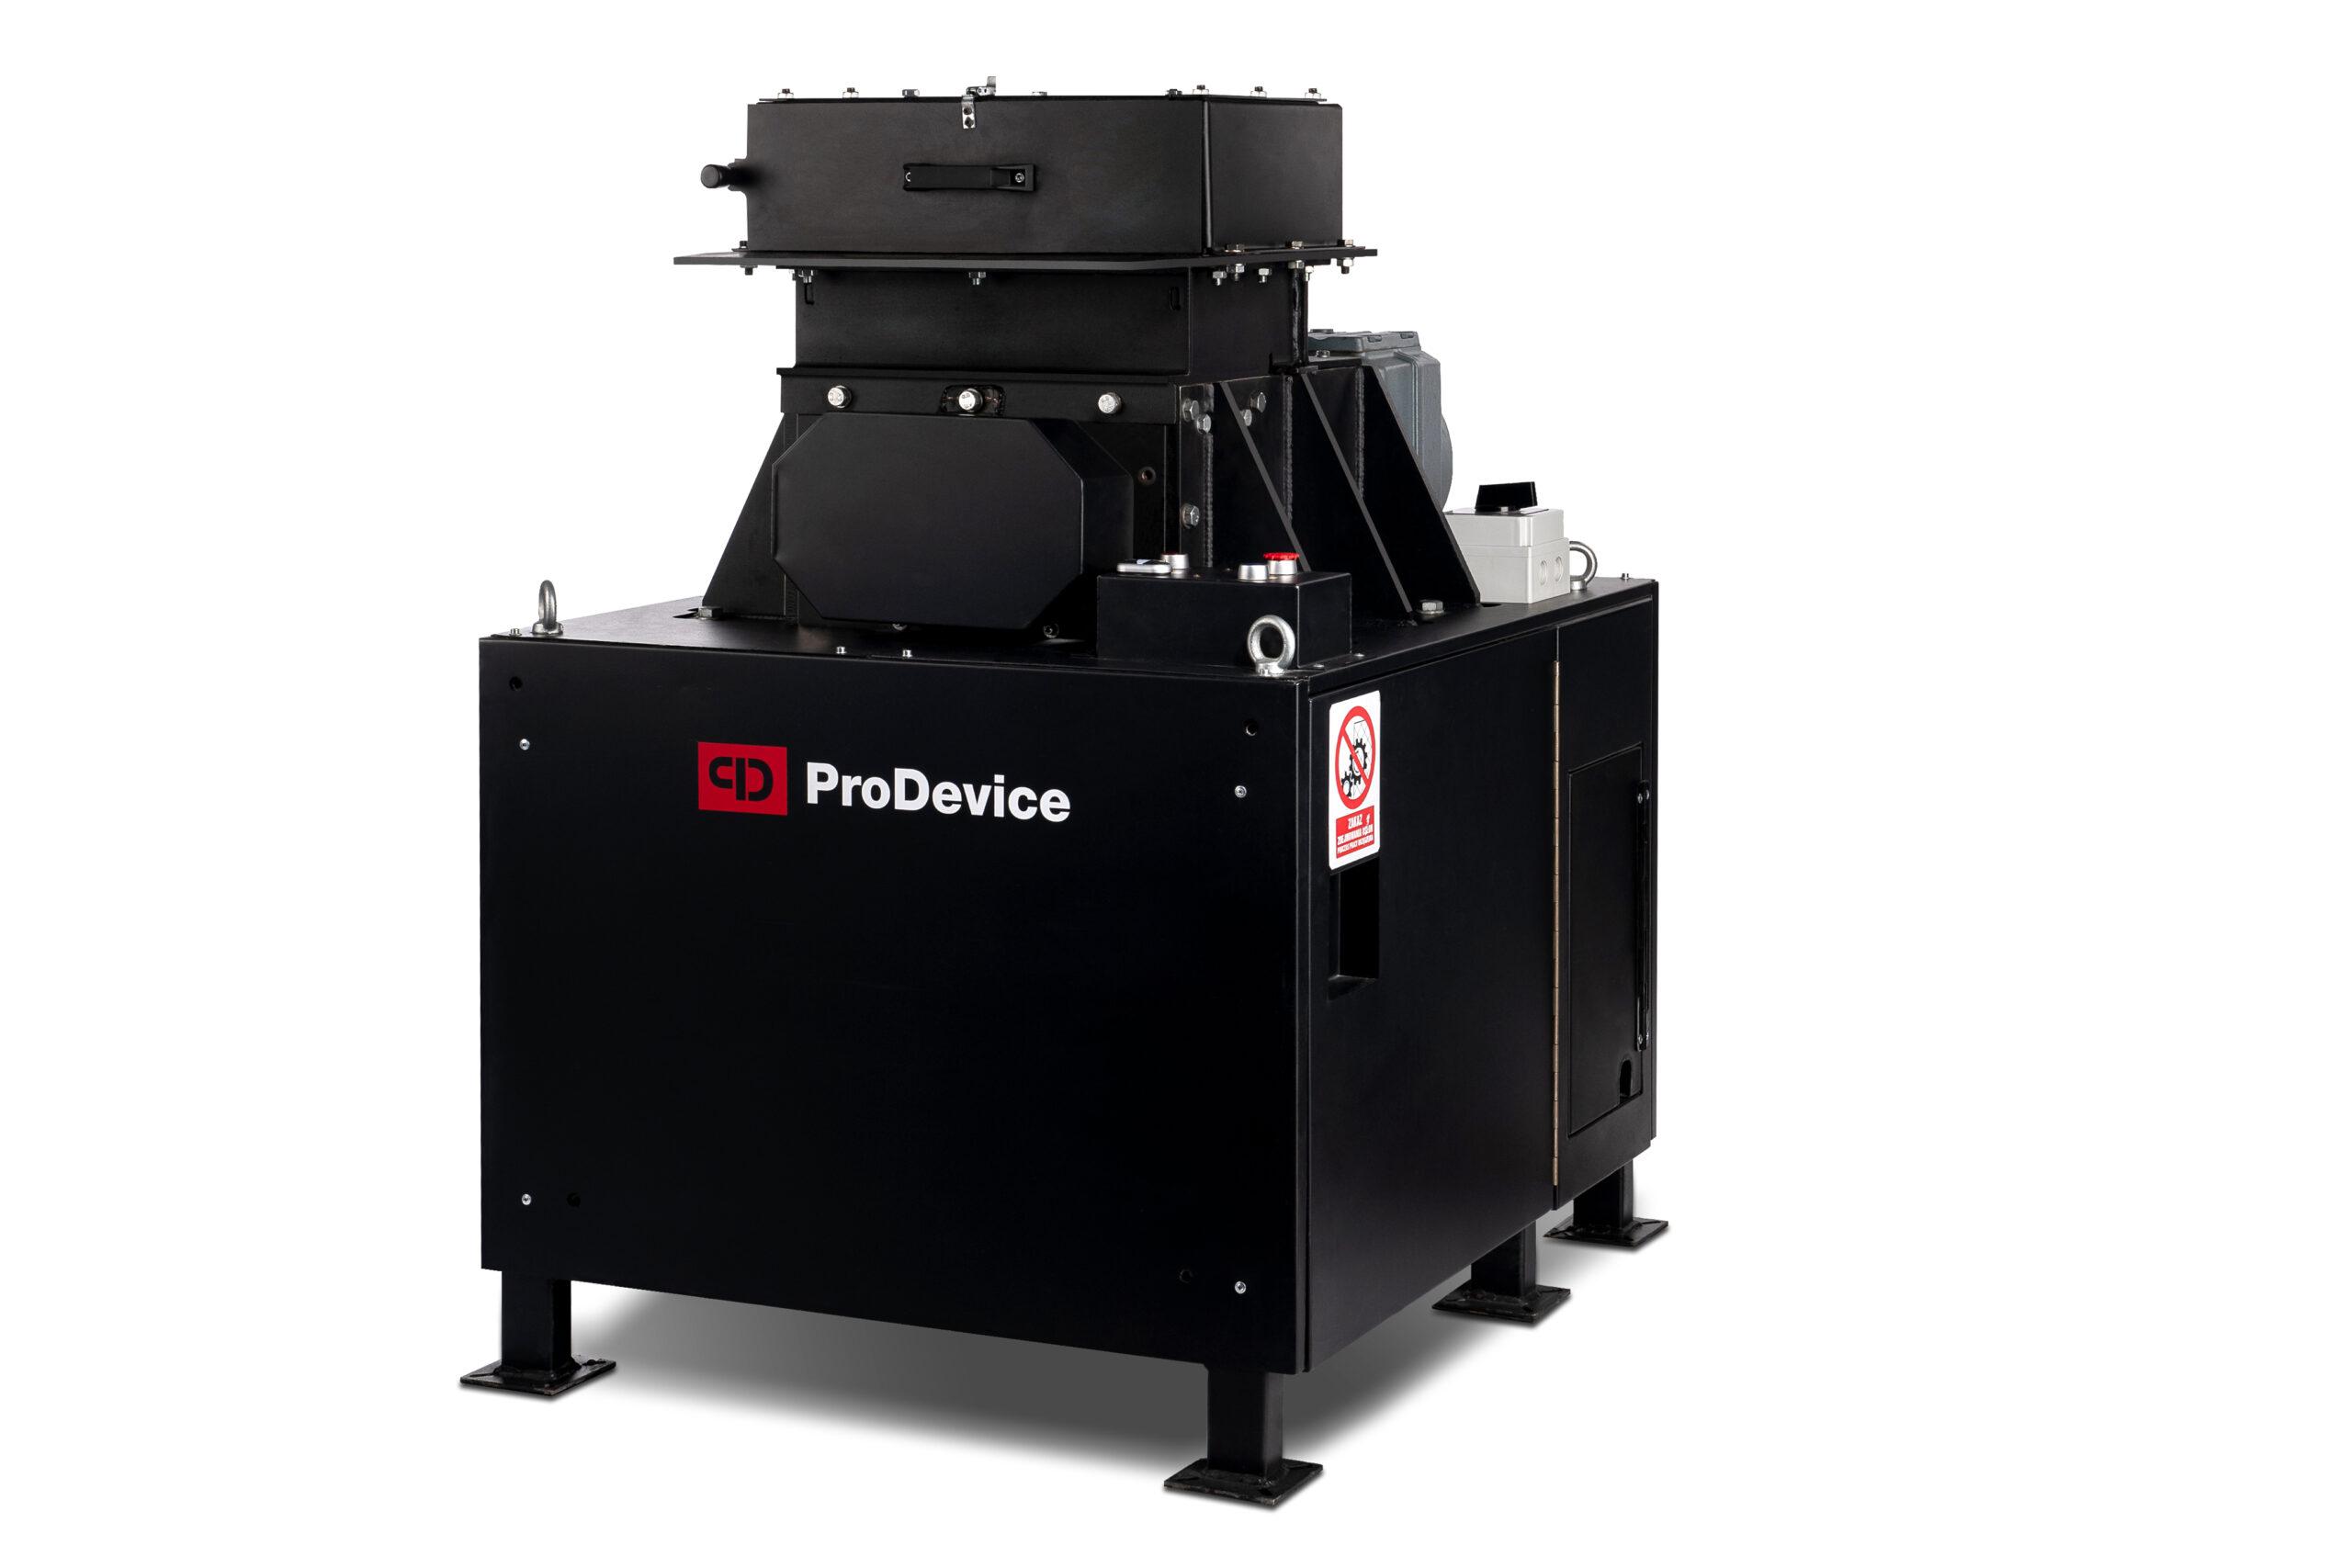 https://www.pro-device.com/wp-content/uploads/2021/06/Prodevice-shredder-scaled.jpg